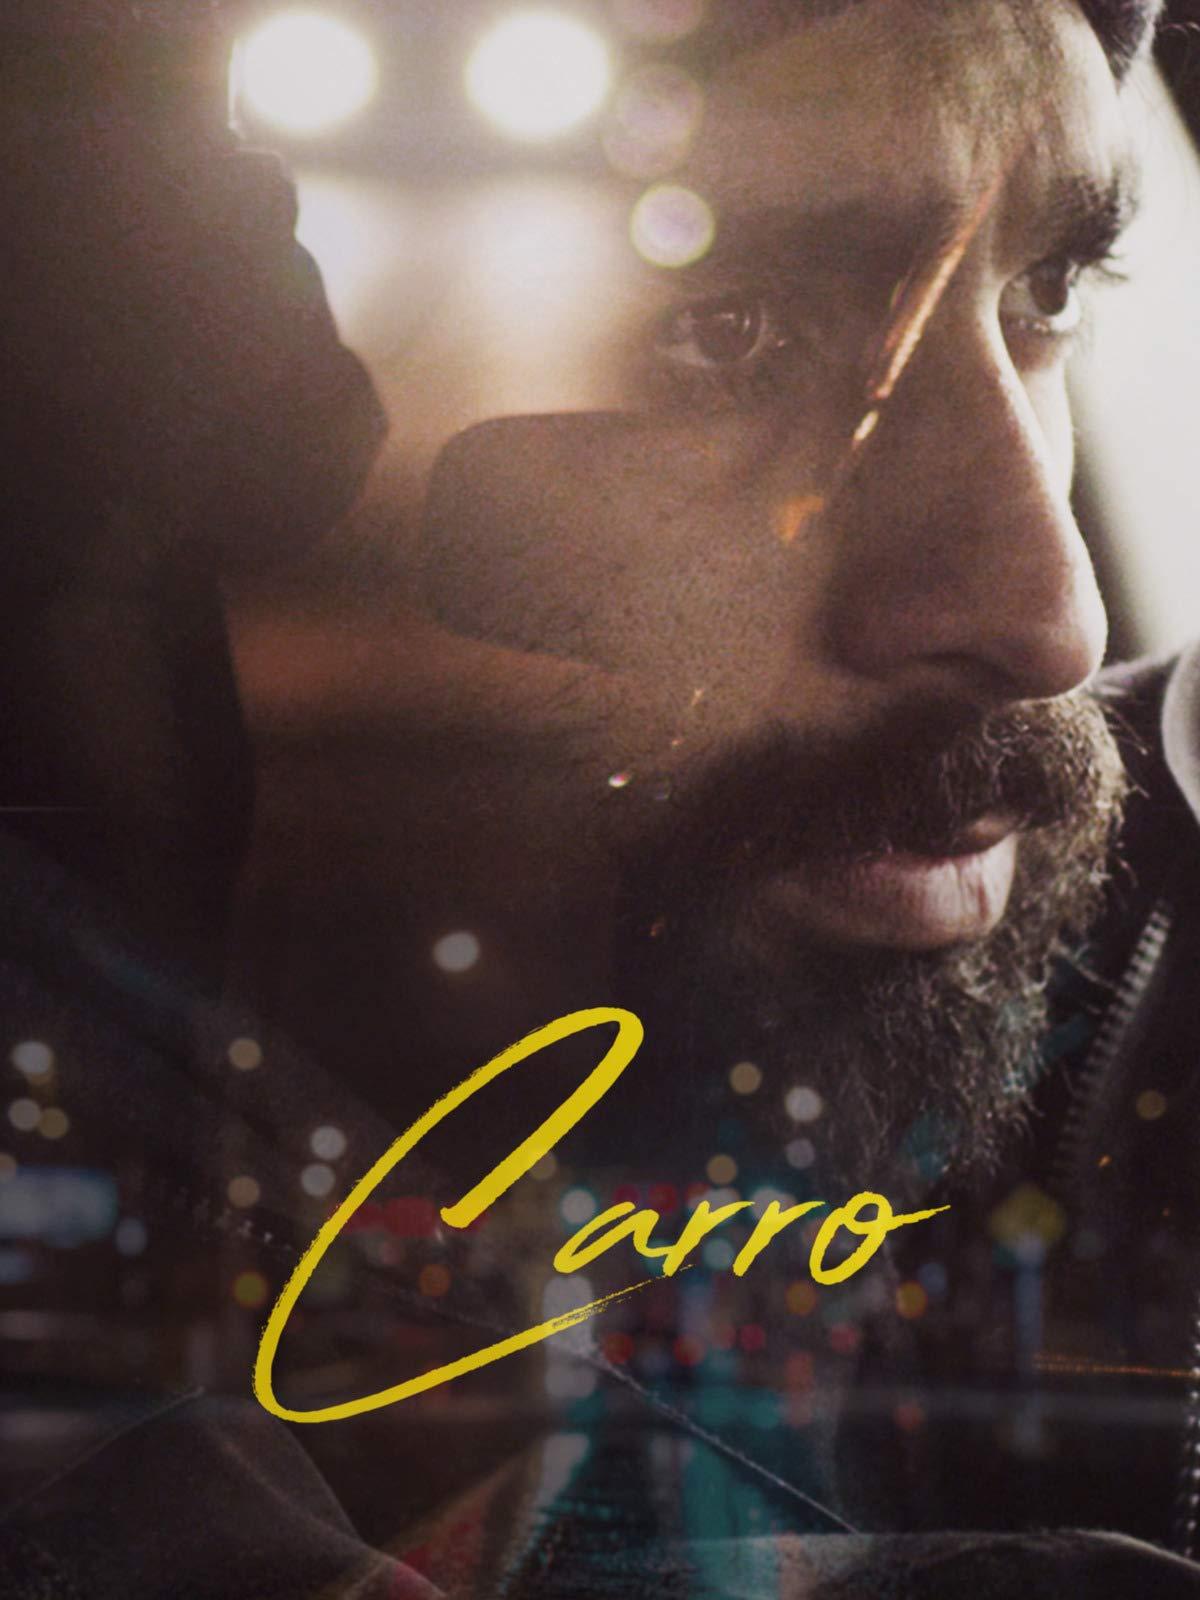 Amazon.com: Carro: Victor Lucena, Volnei Rosa, Fernando ...